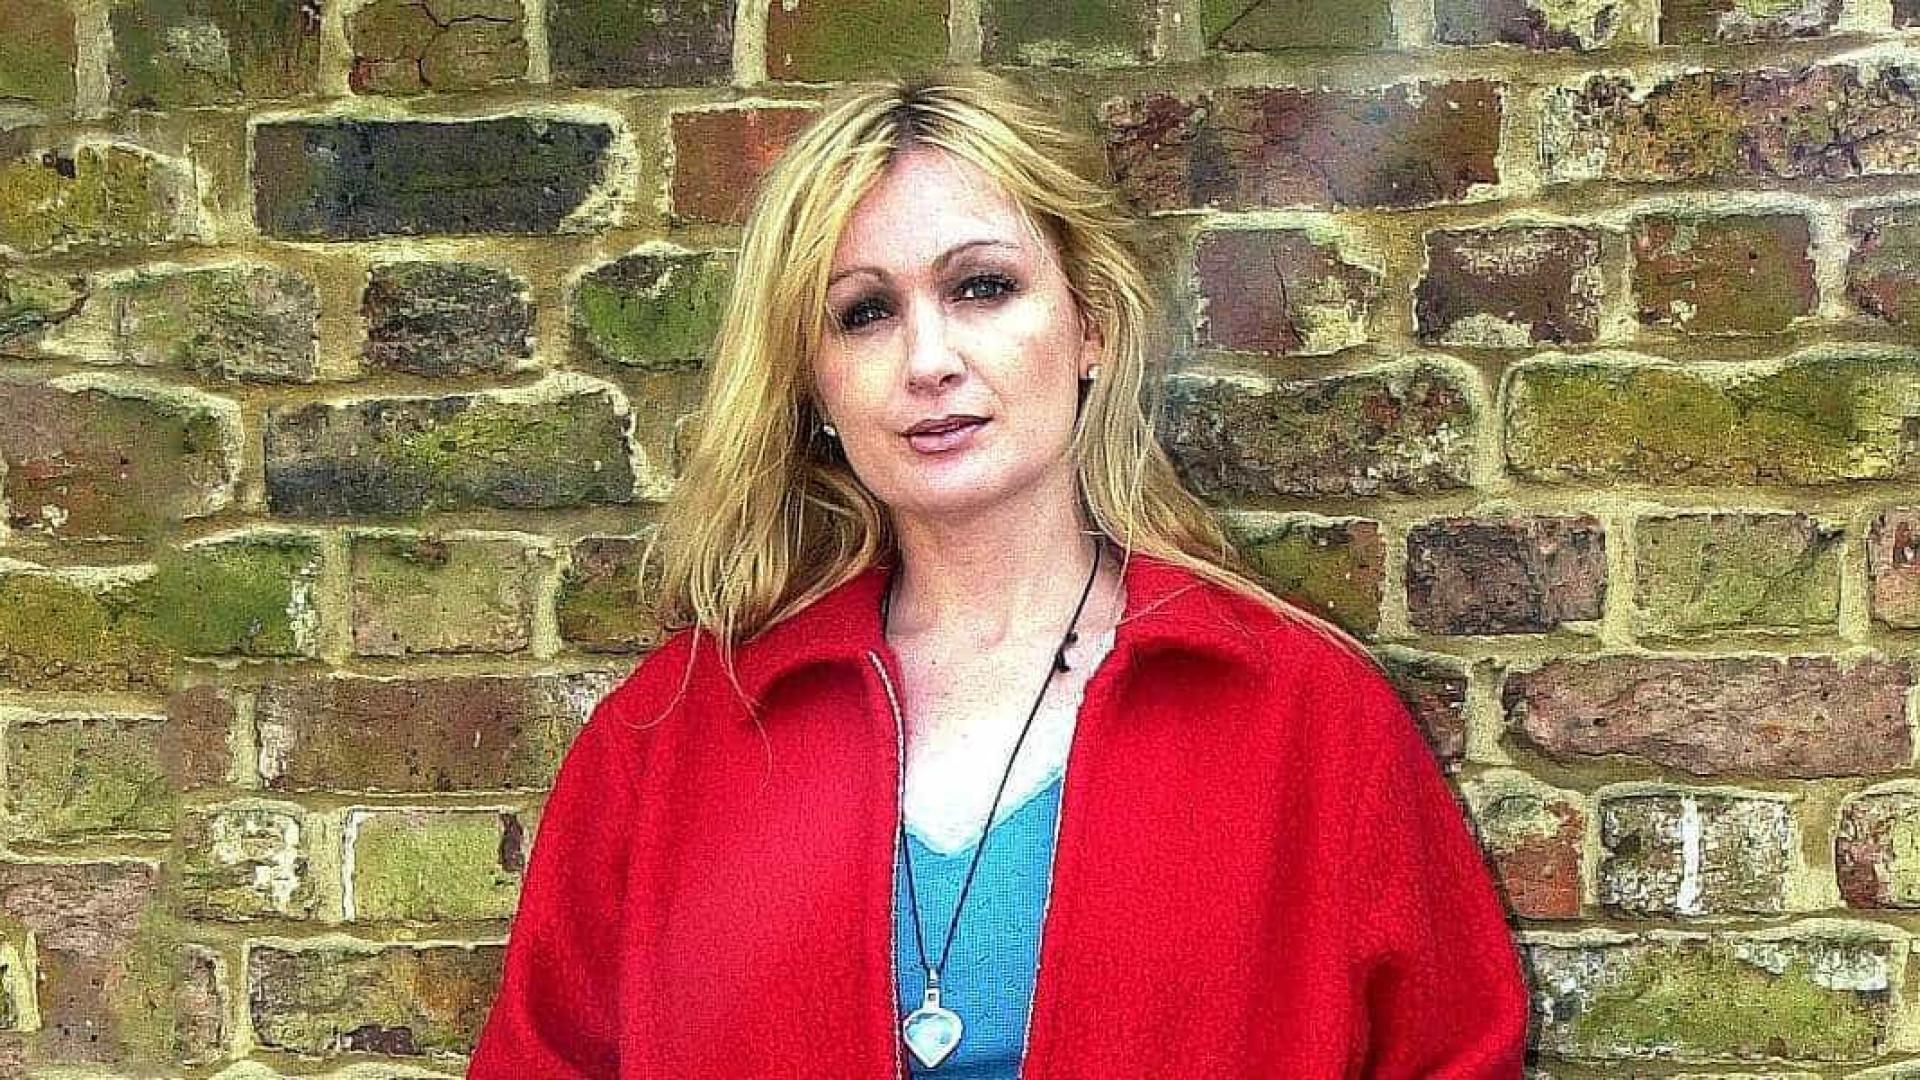 Morreu a atriz britânica Caroline Aherne